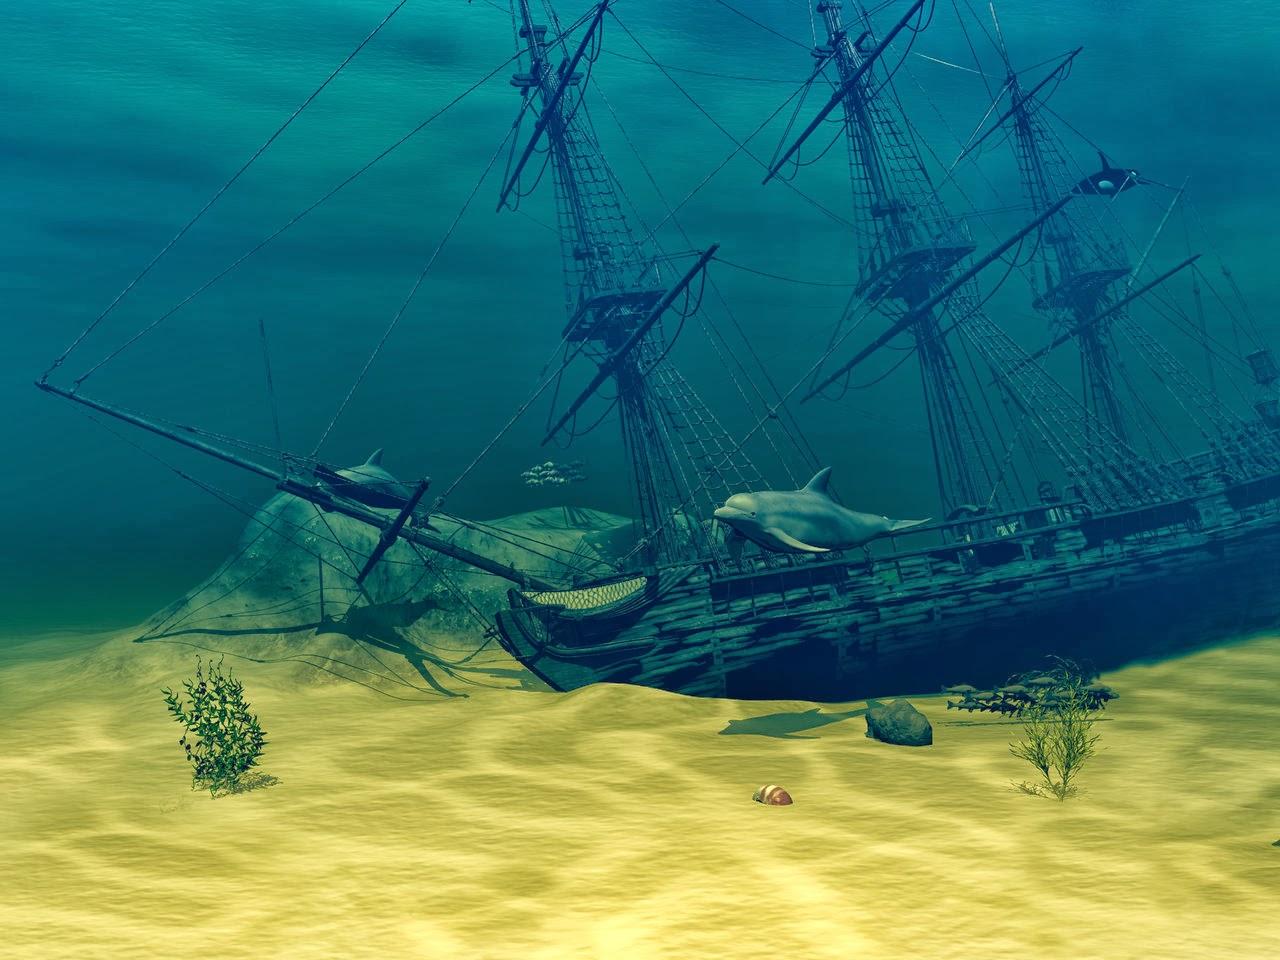 Sacred Ground Travel Magazine: Primal Wilderness Rambling ... |Sunken Ships Underwater